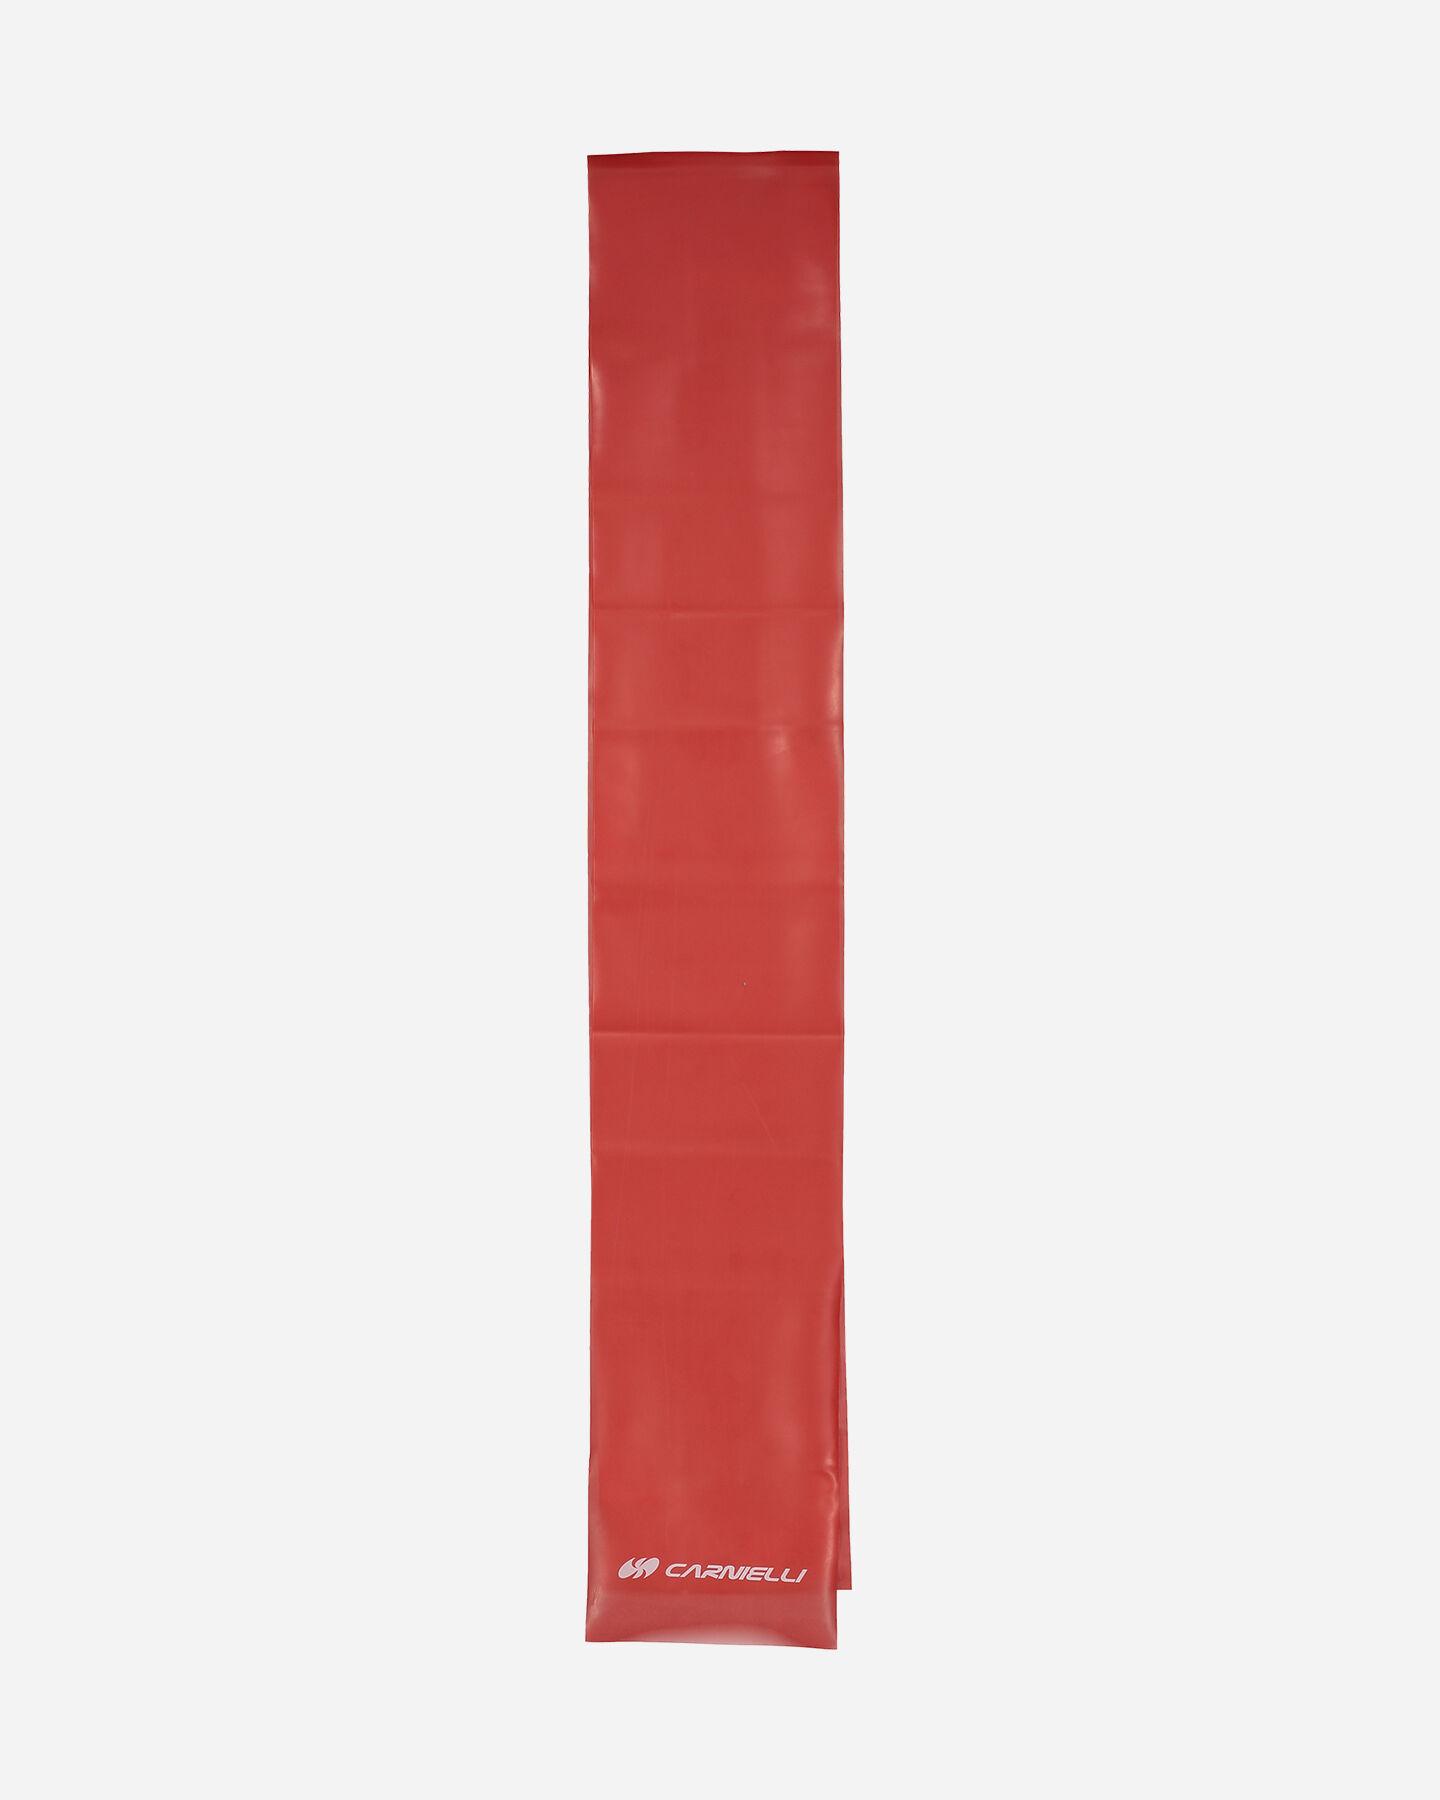 Banda elastica CARNIELLI BANDA ELASTICA 175 CM S1326894|1|UNI scatto 0